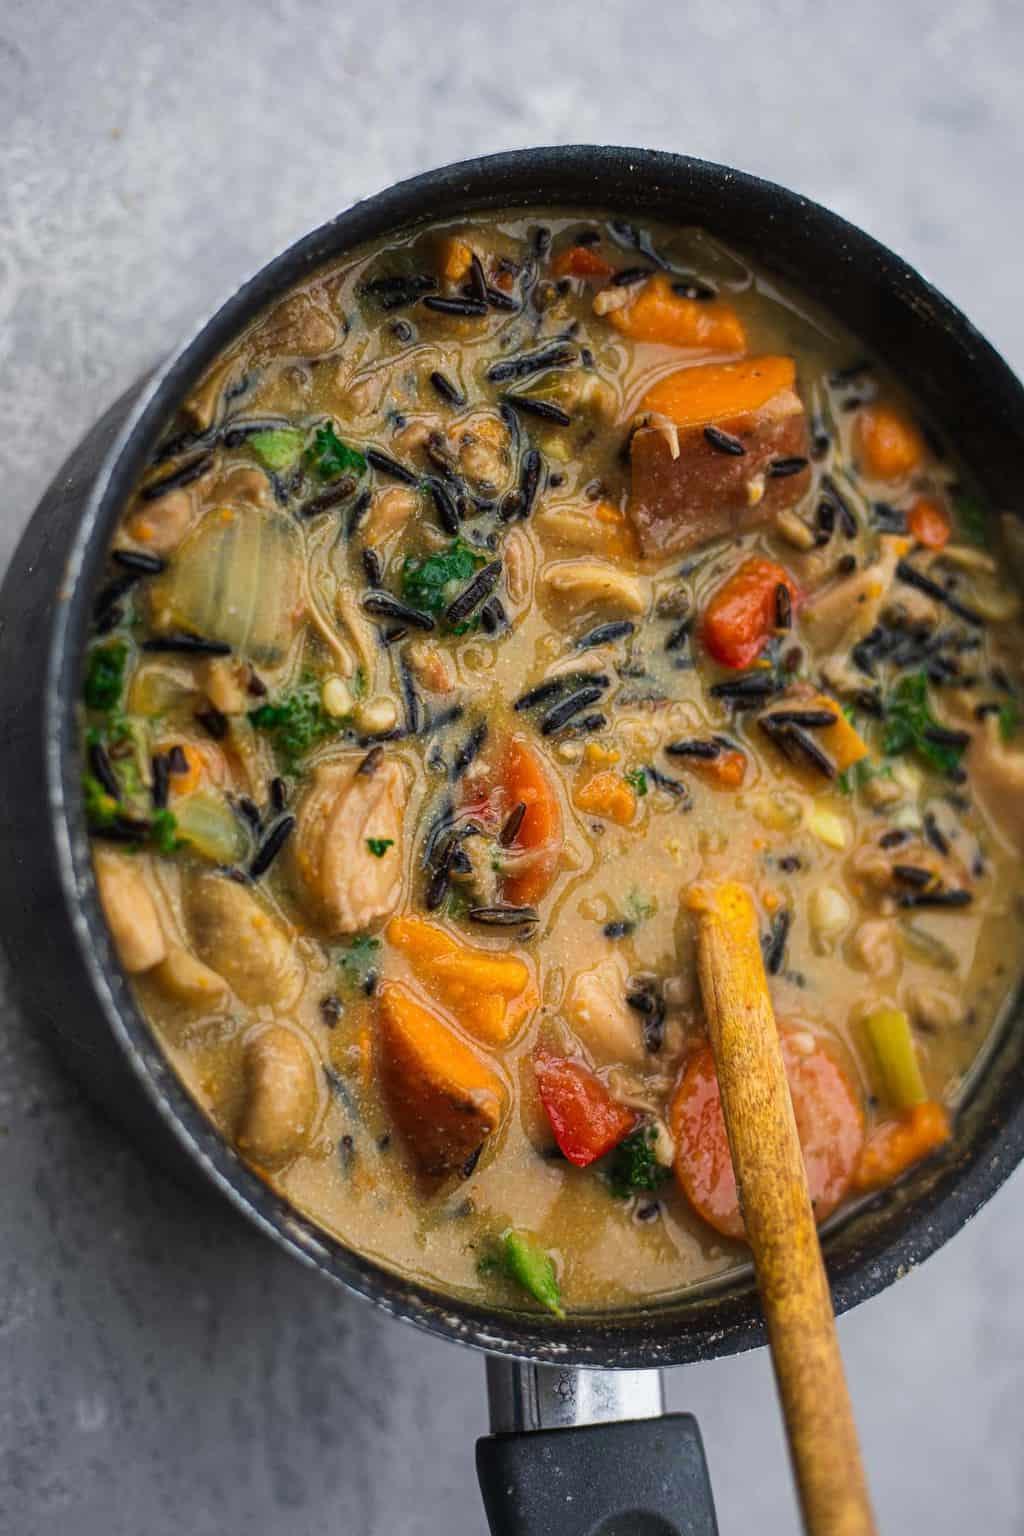 Saucepan with creamy vegan vegetable soup